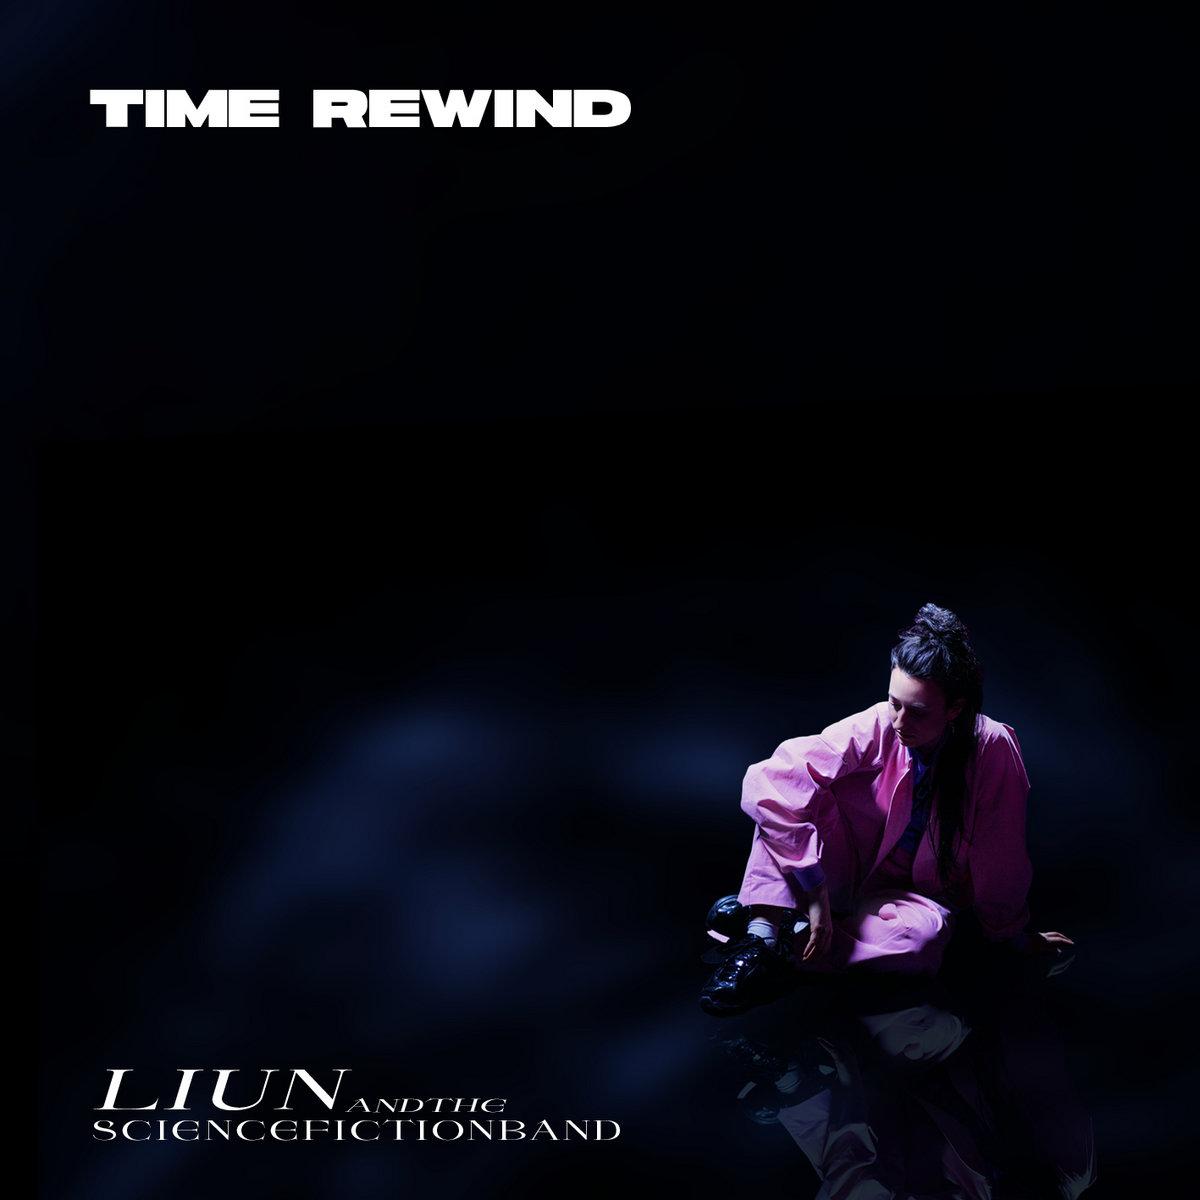 Liun + The Science Fiction Band - Time Rewind [LP]